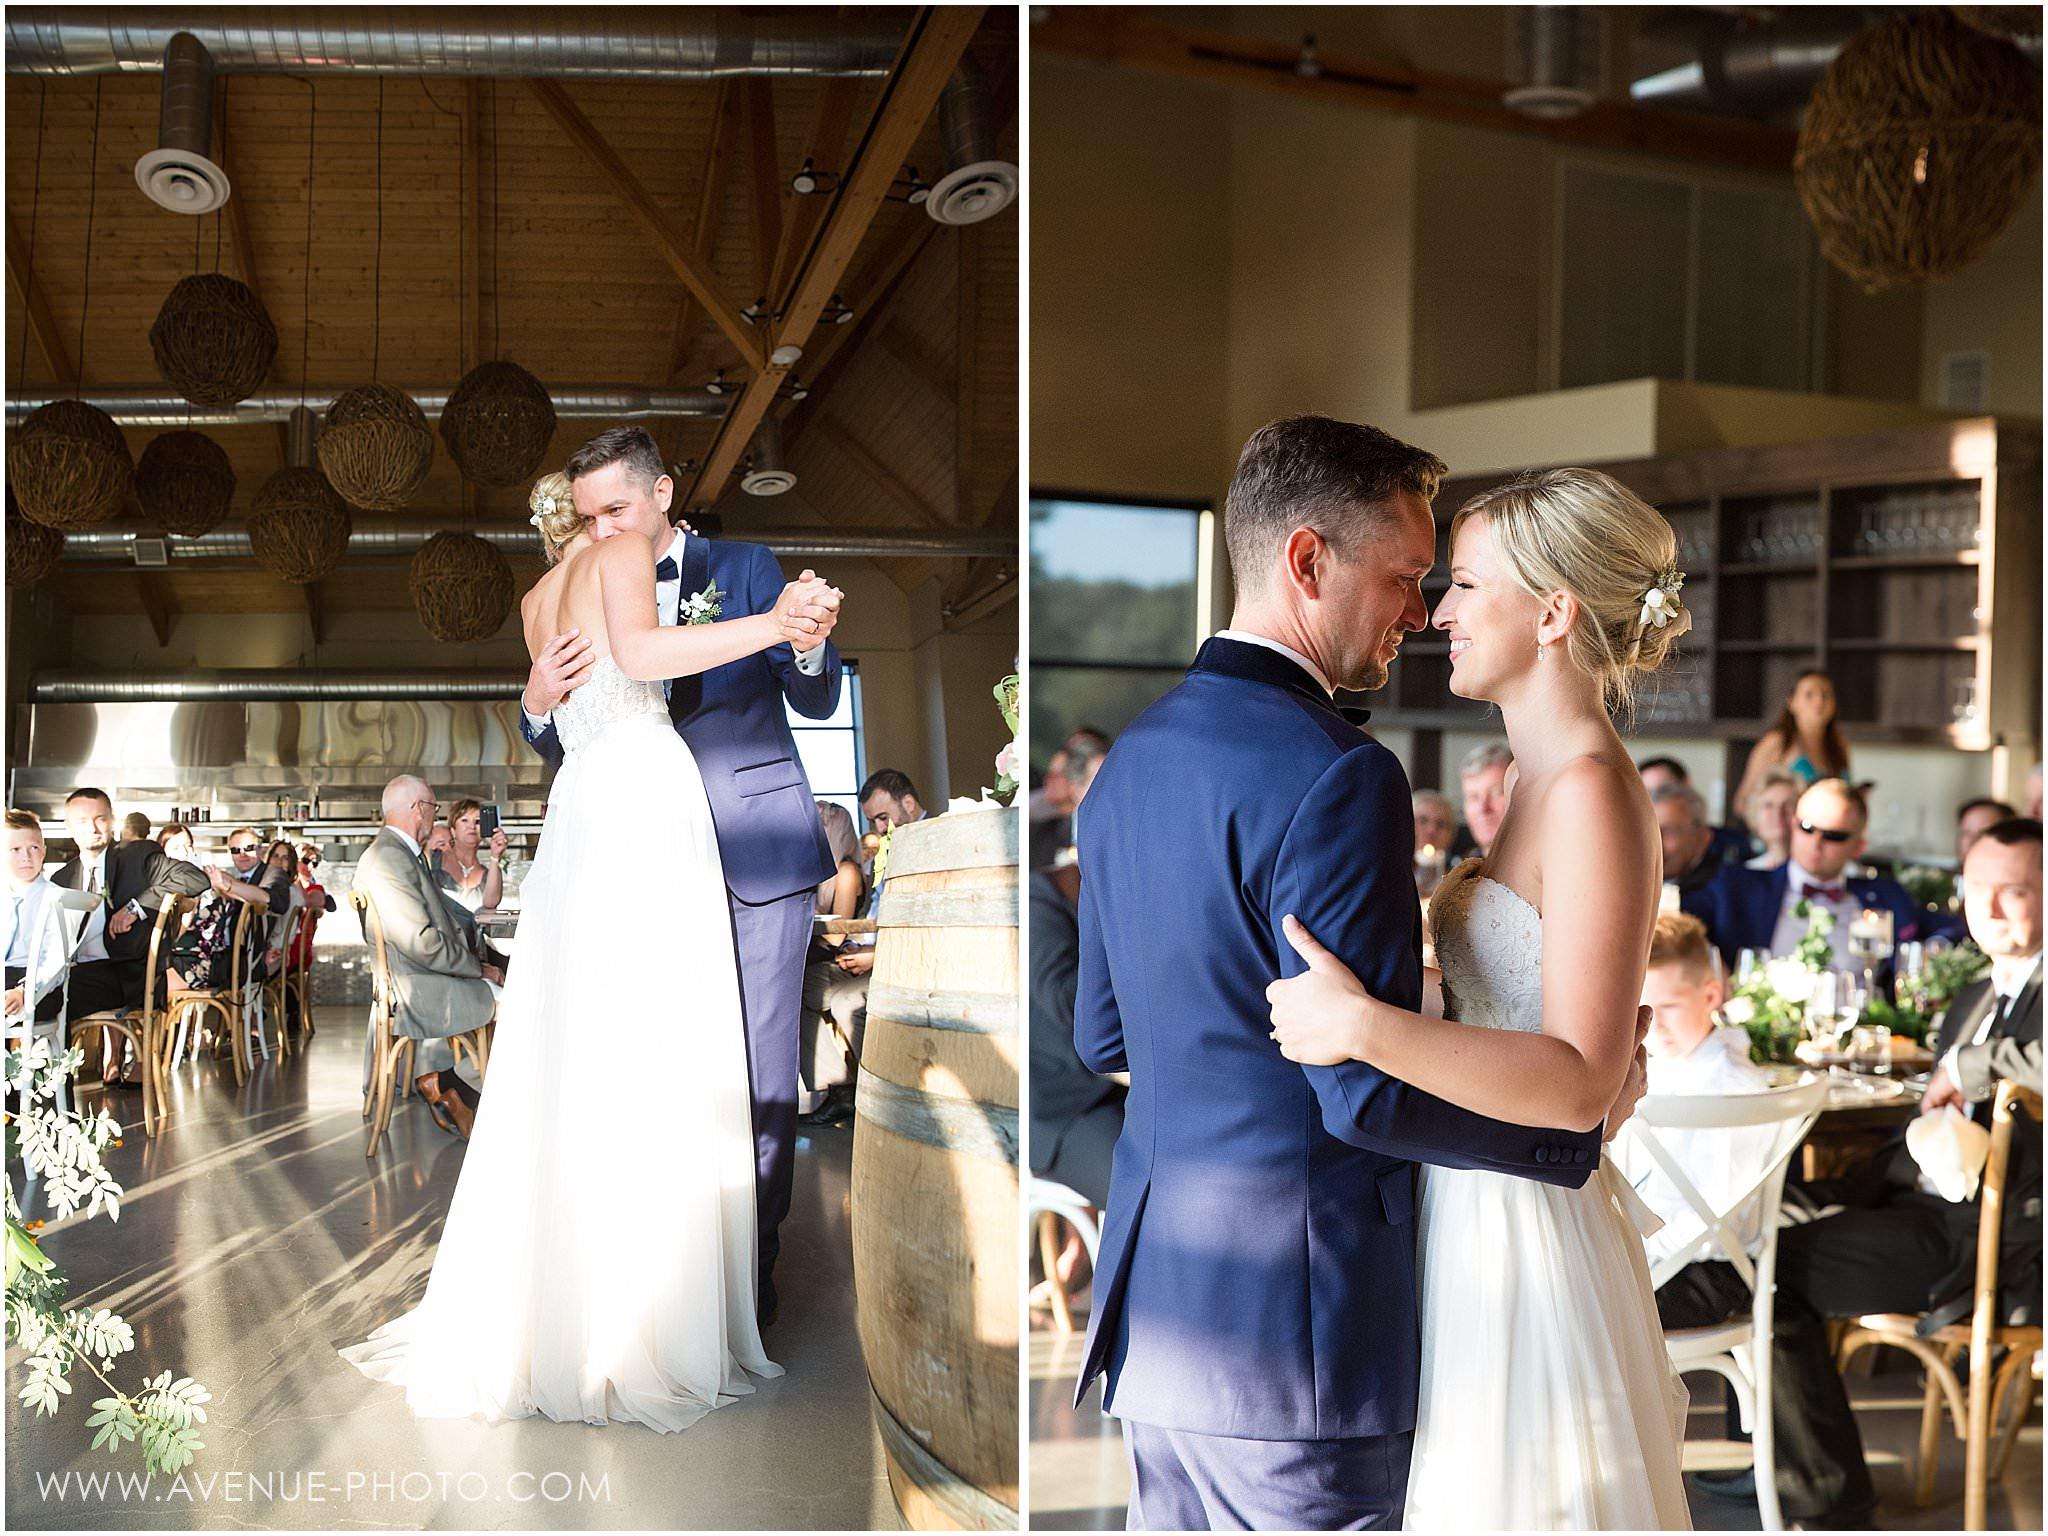 First Dance, Adamo Estate Winery Wedding Photos, Hockley Valley Wedding Photos, Orangeville Wedding Photos, Vineyard Wedding, Avenue Photo